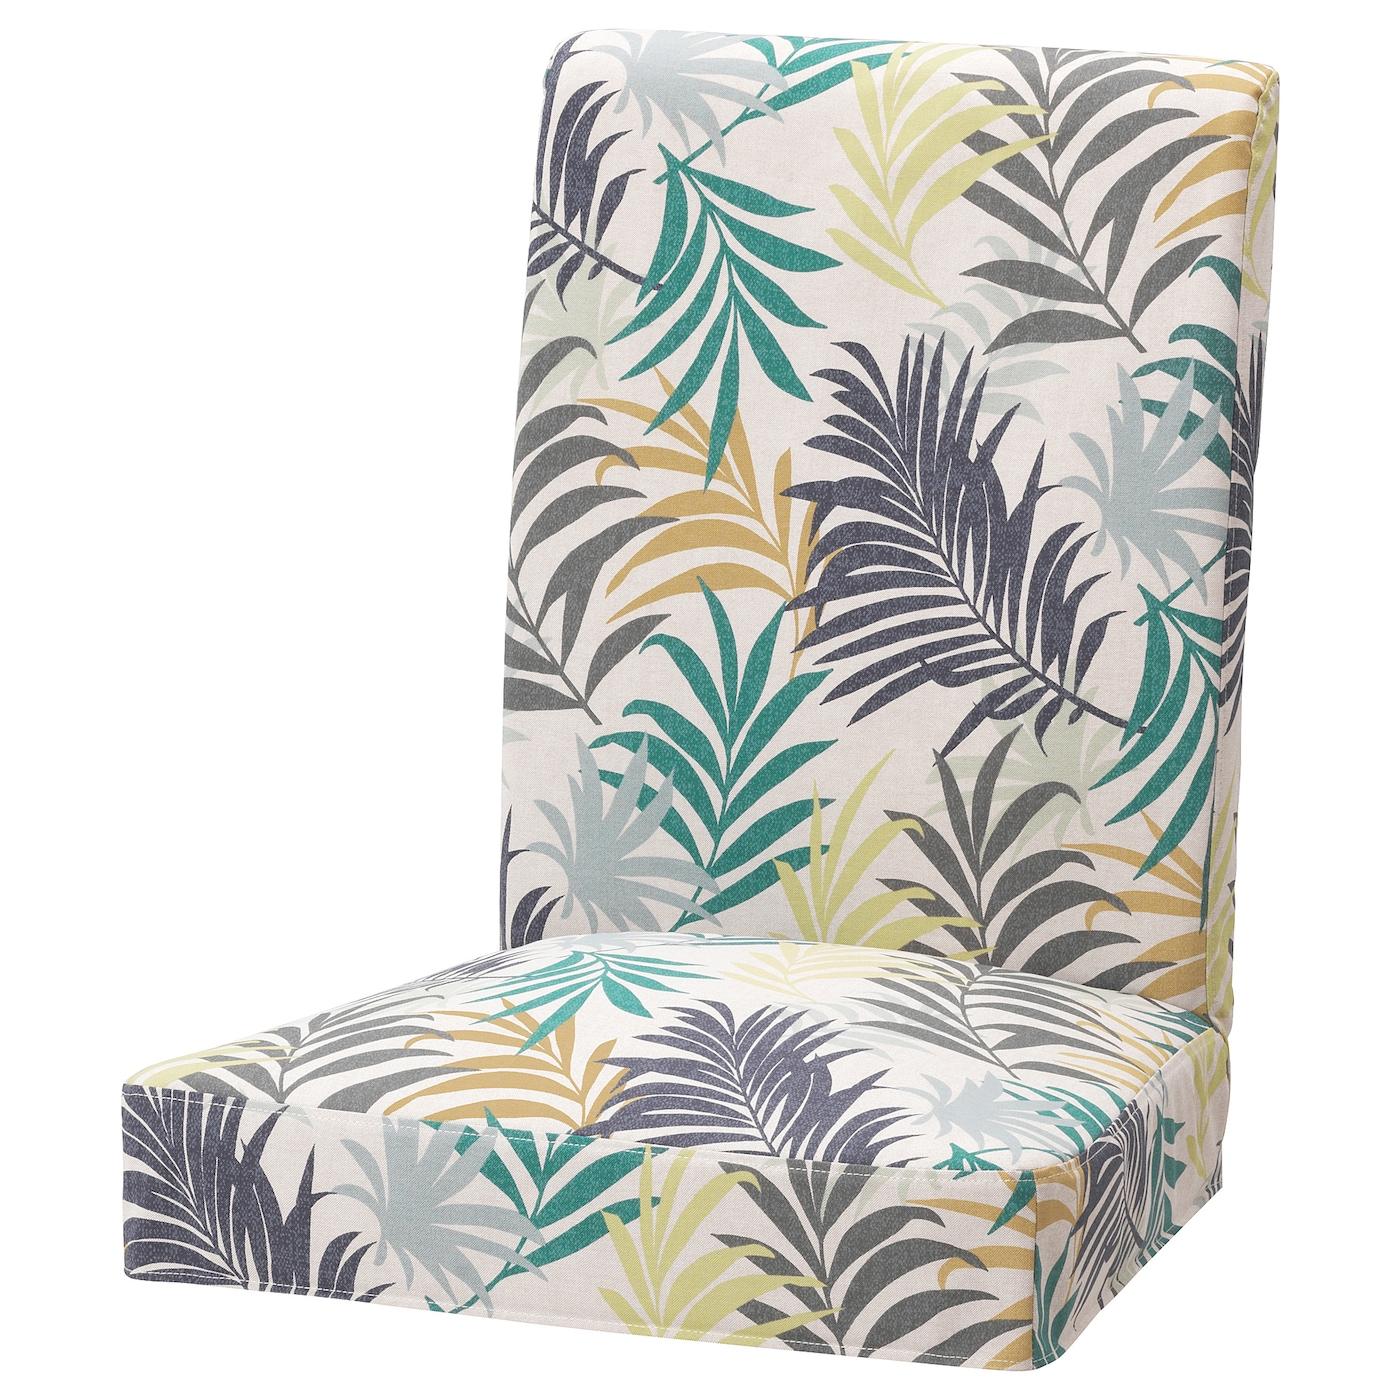 henriksdal housse pour chaise gillhov multicolore ikea. Black Bedroom Furniture Sets. Home Design Ideas